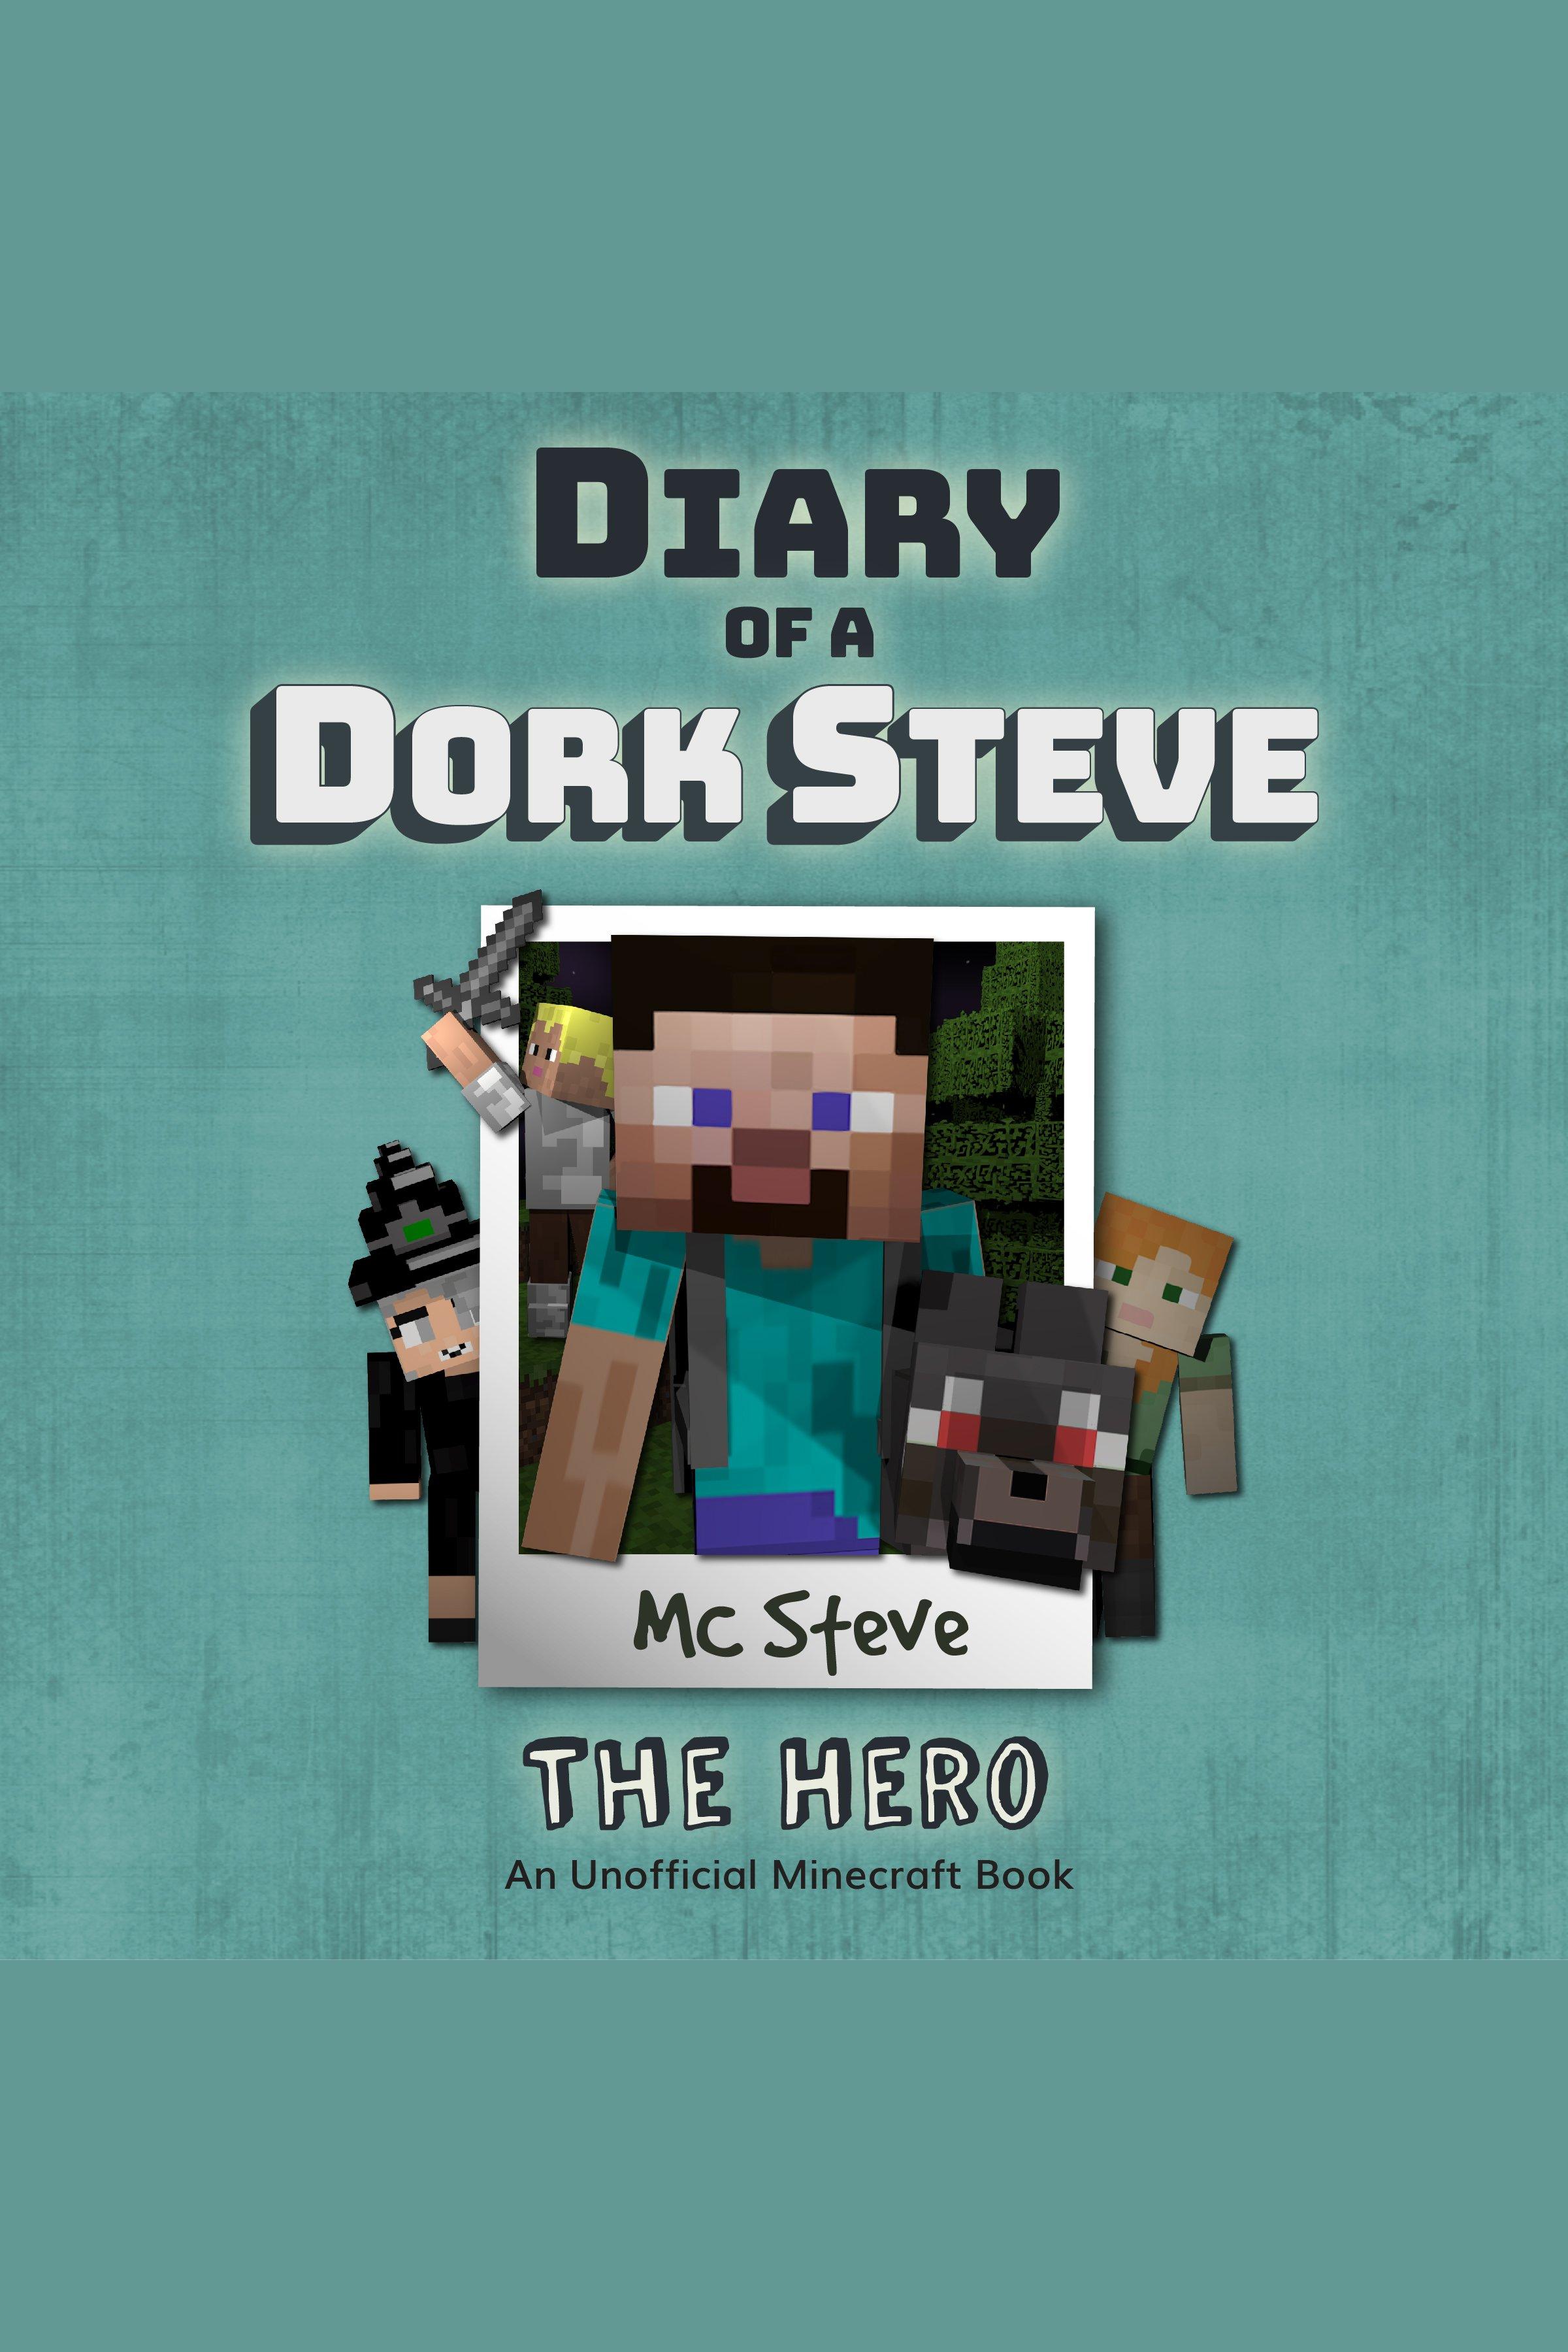 Diary Of A Minecraft Dork Steve Book 2: The Hero (An Unofficial Minecraft Book)